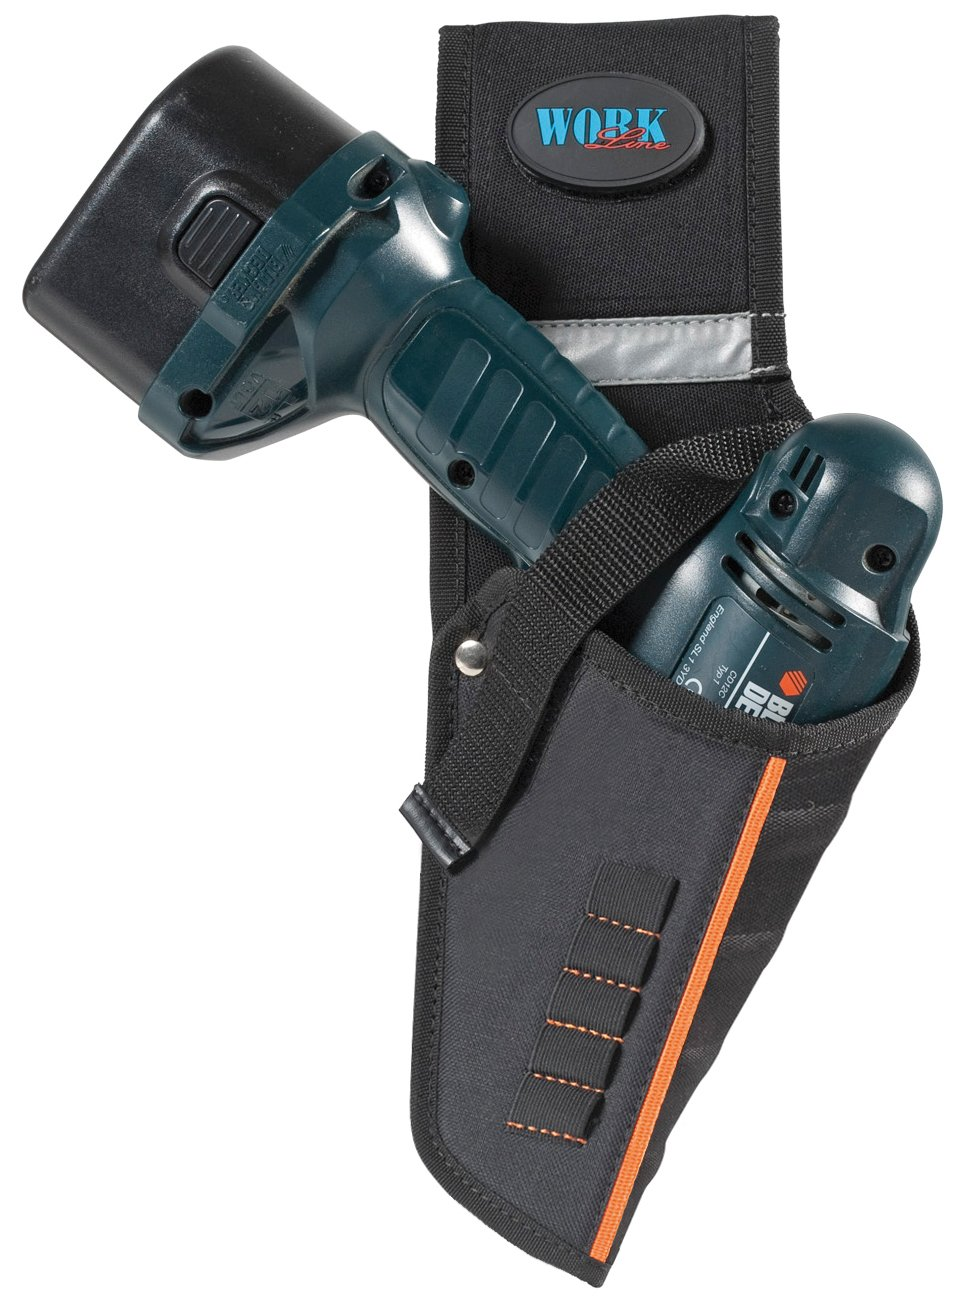 GT LINE TOPDRILLN Funda para taladros a baterí a Adaptable a Top Belt N (Interior 180 x 340 mm) TOP DRILL N